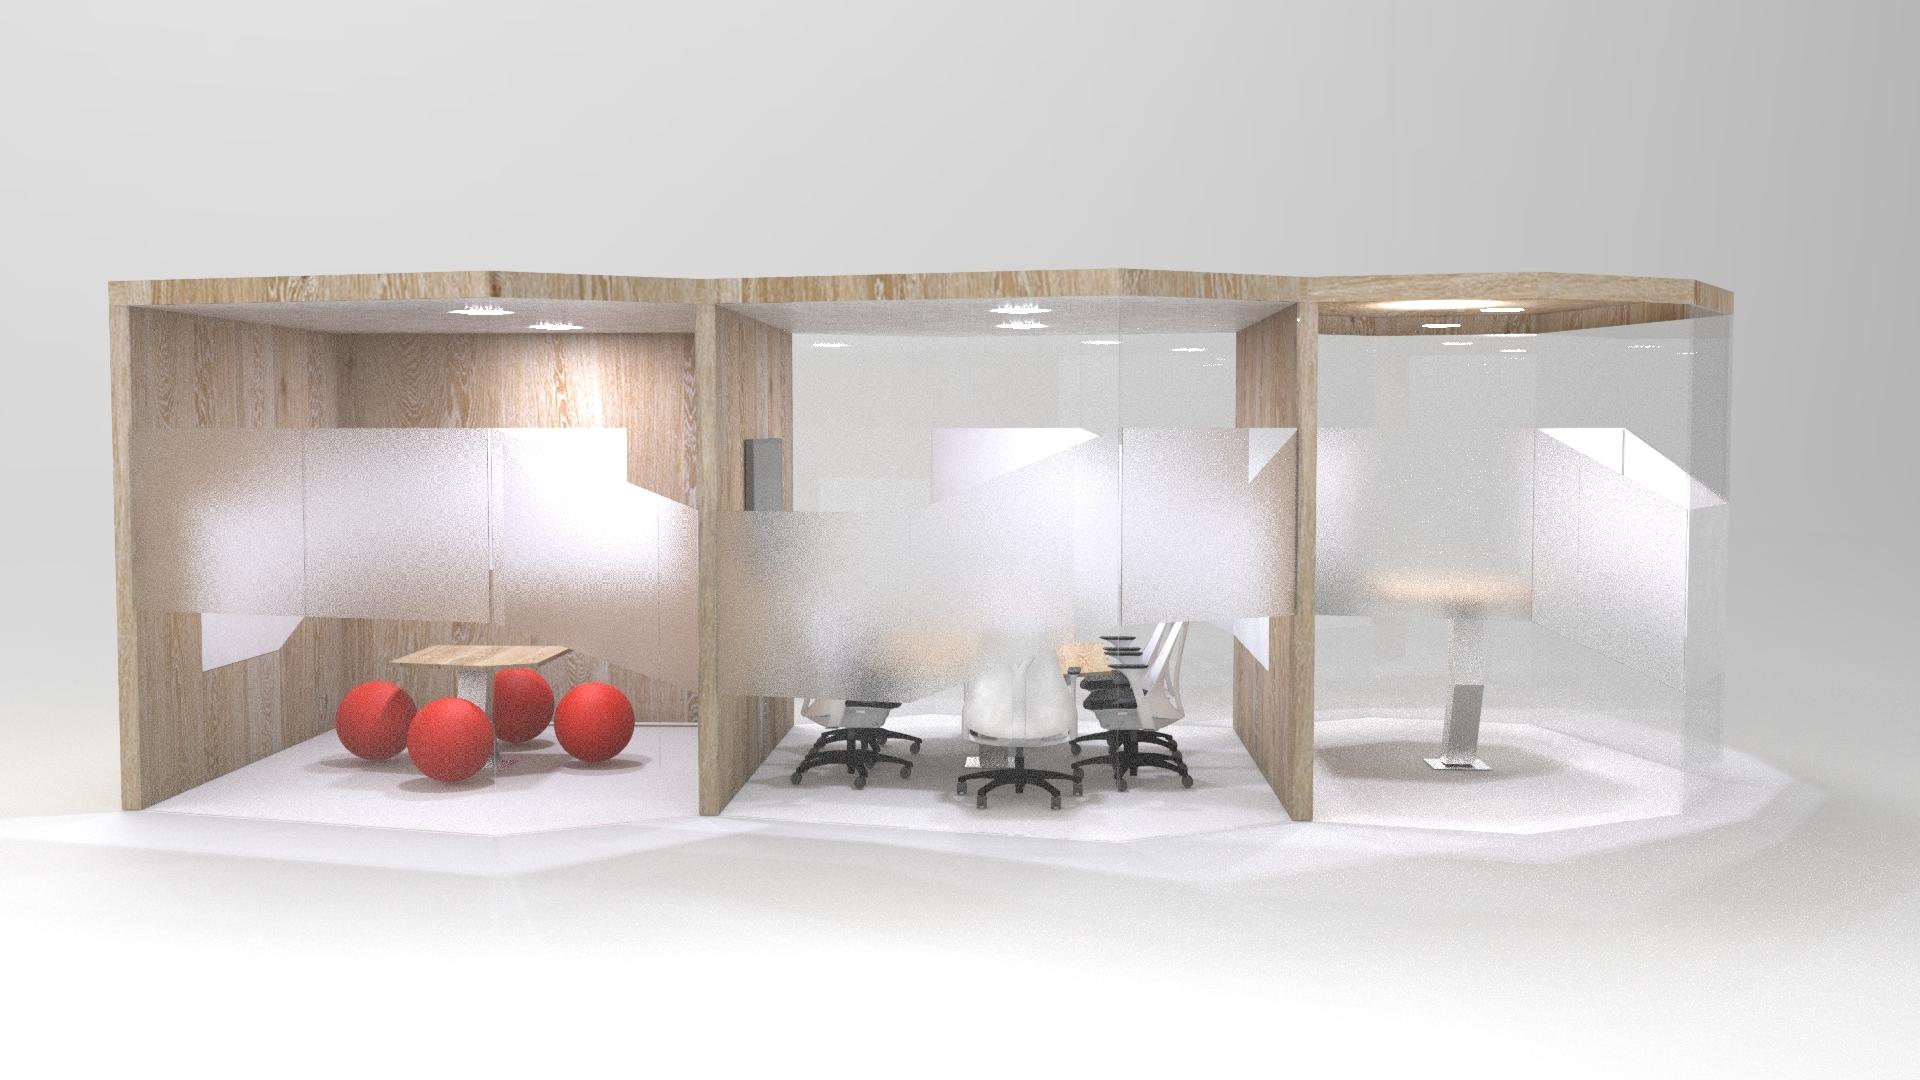 Set of 3 meeting rooms